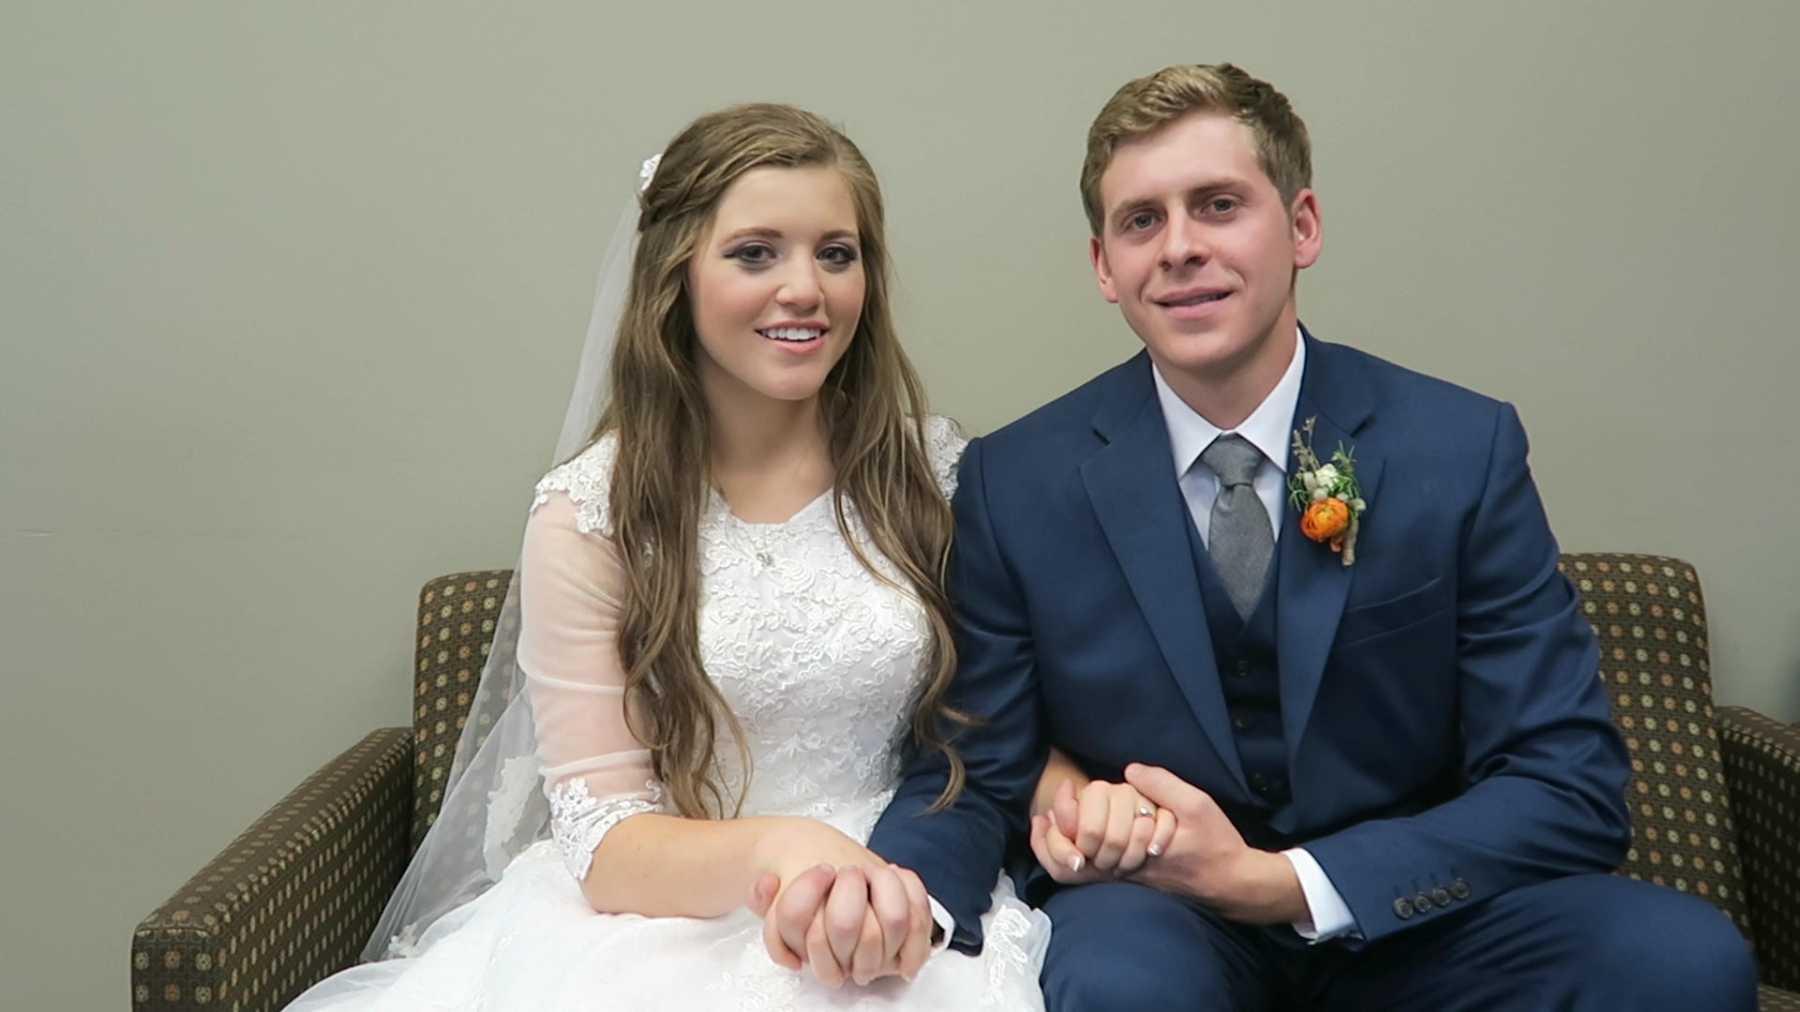 Did Joy-Anna Duggar Get Pregnant Out Of Wedlock? | Duggar